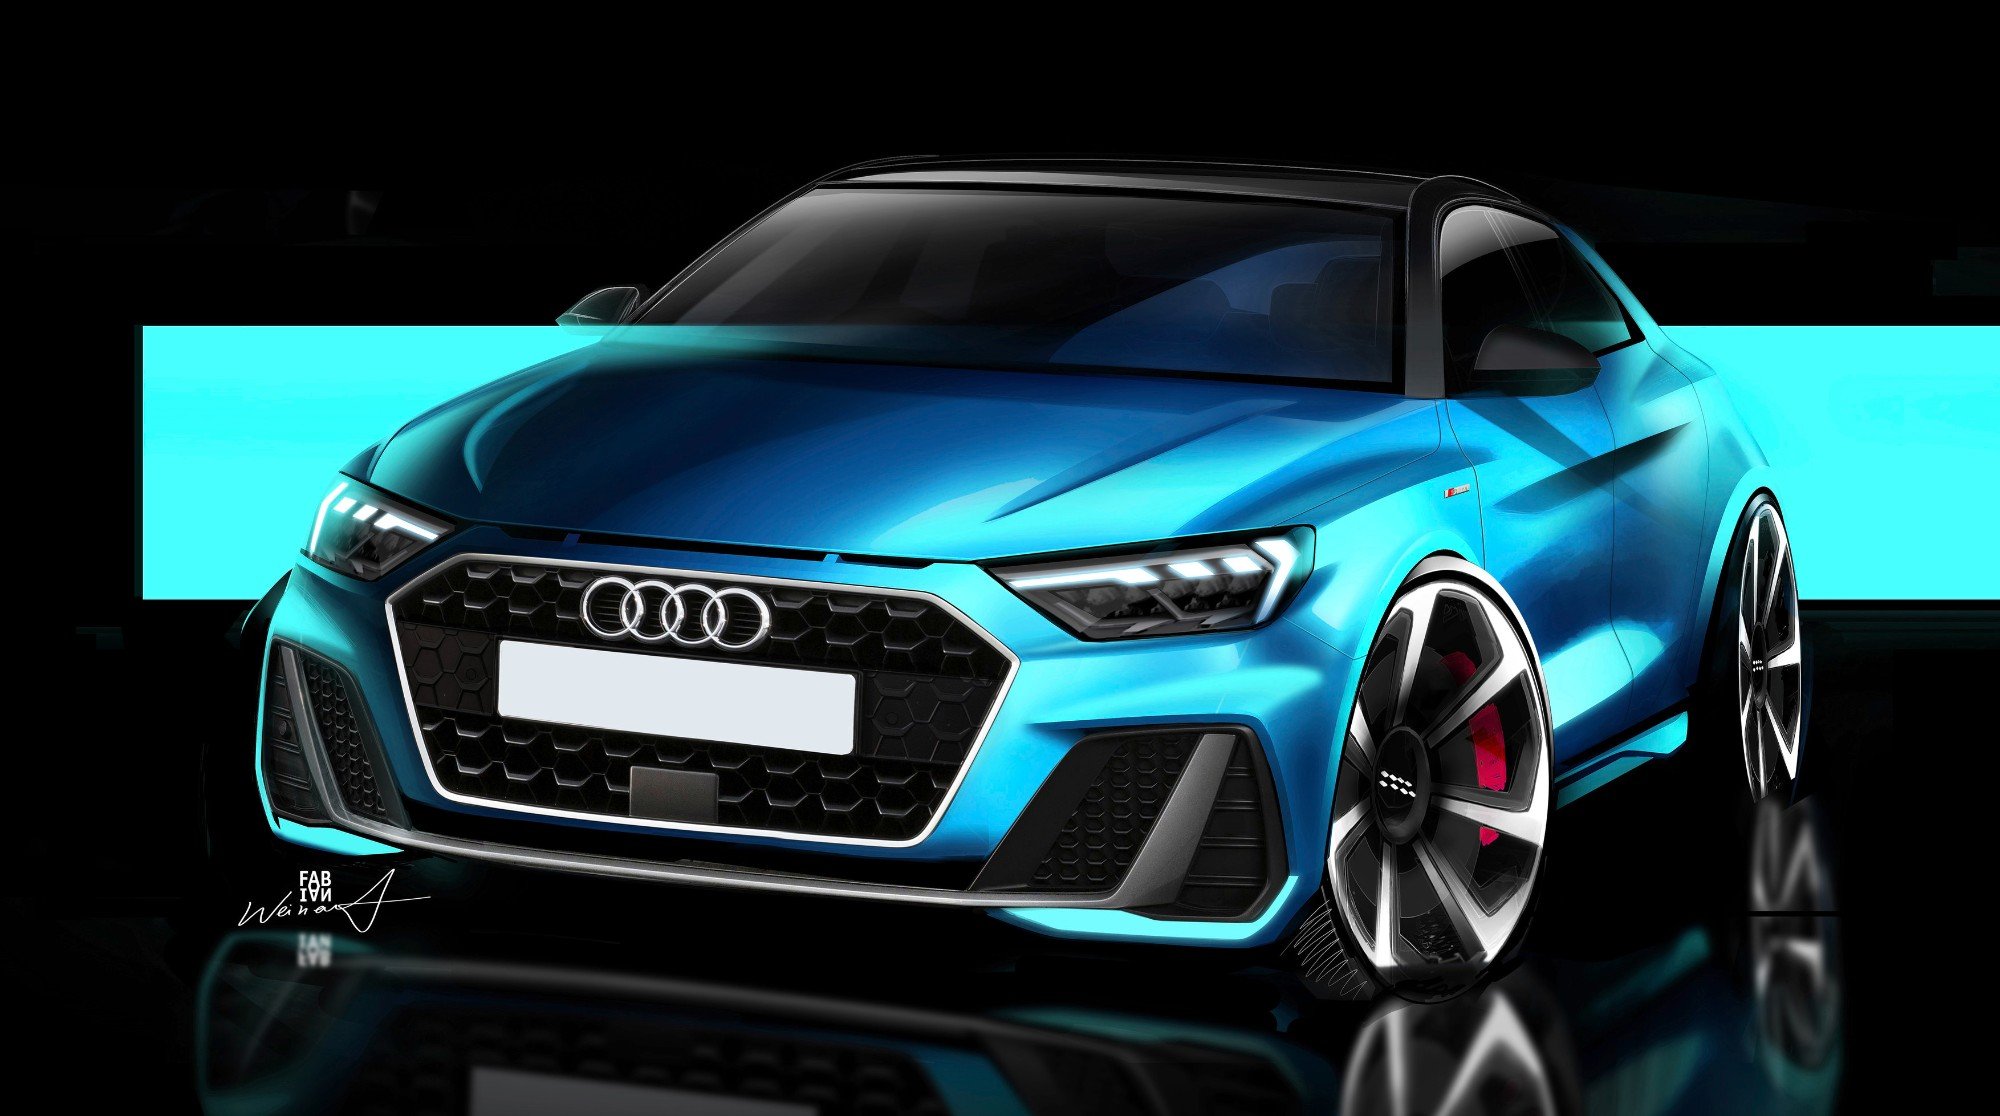 New Audi A1 Sportback Ideal Companion For An Urban Lifestyle